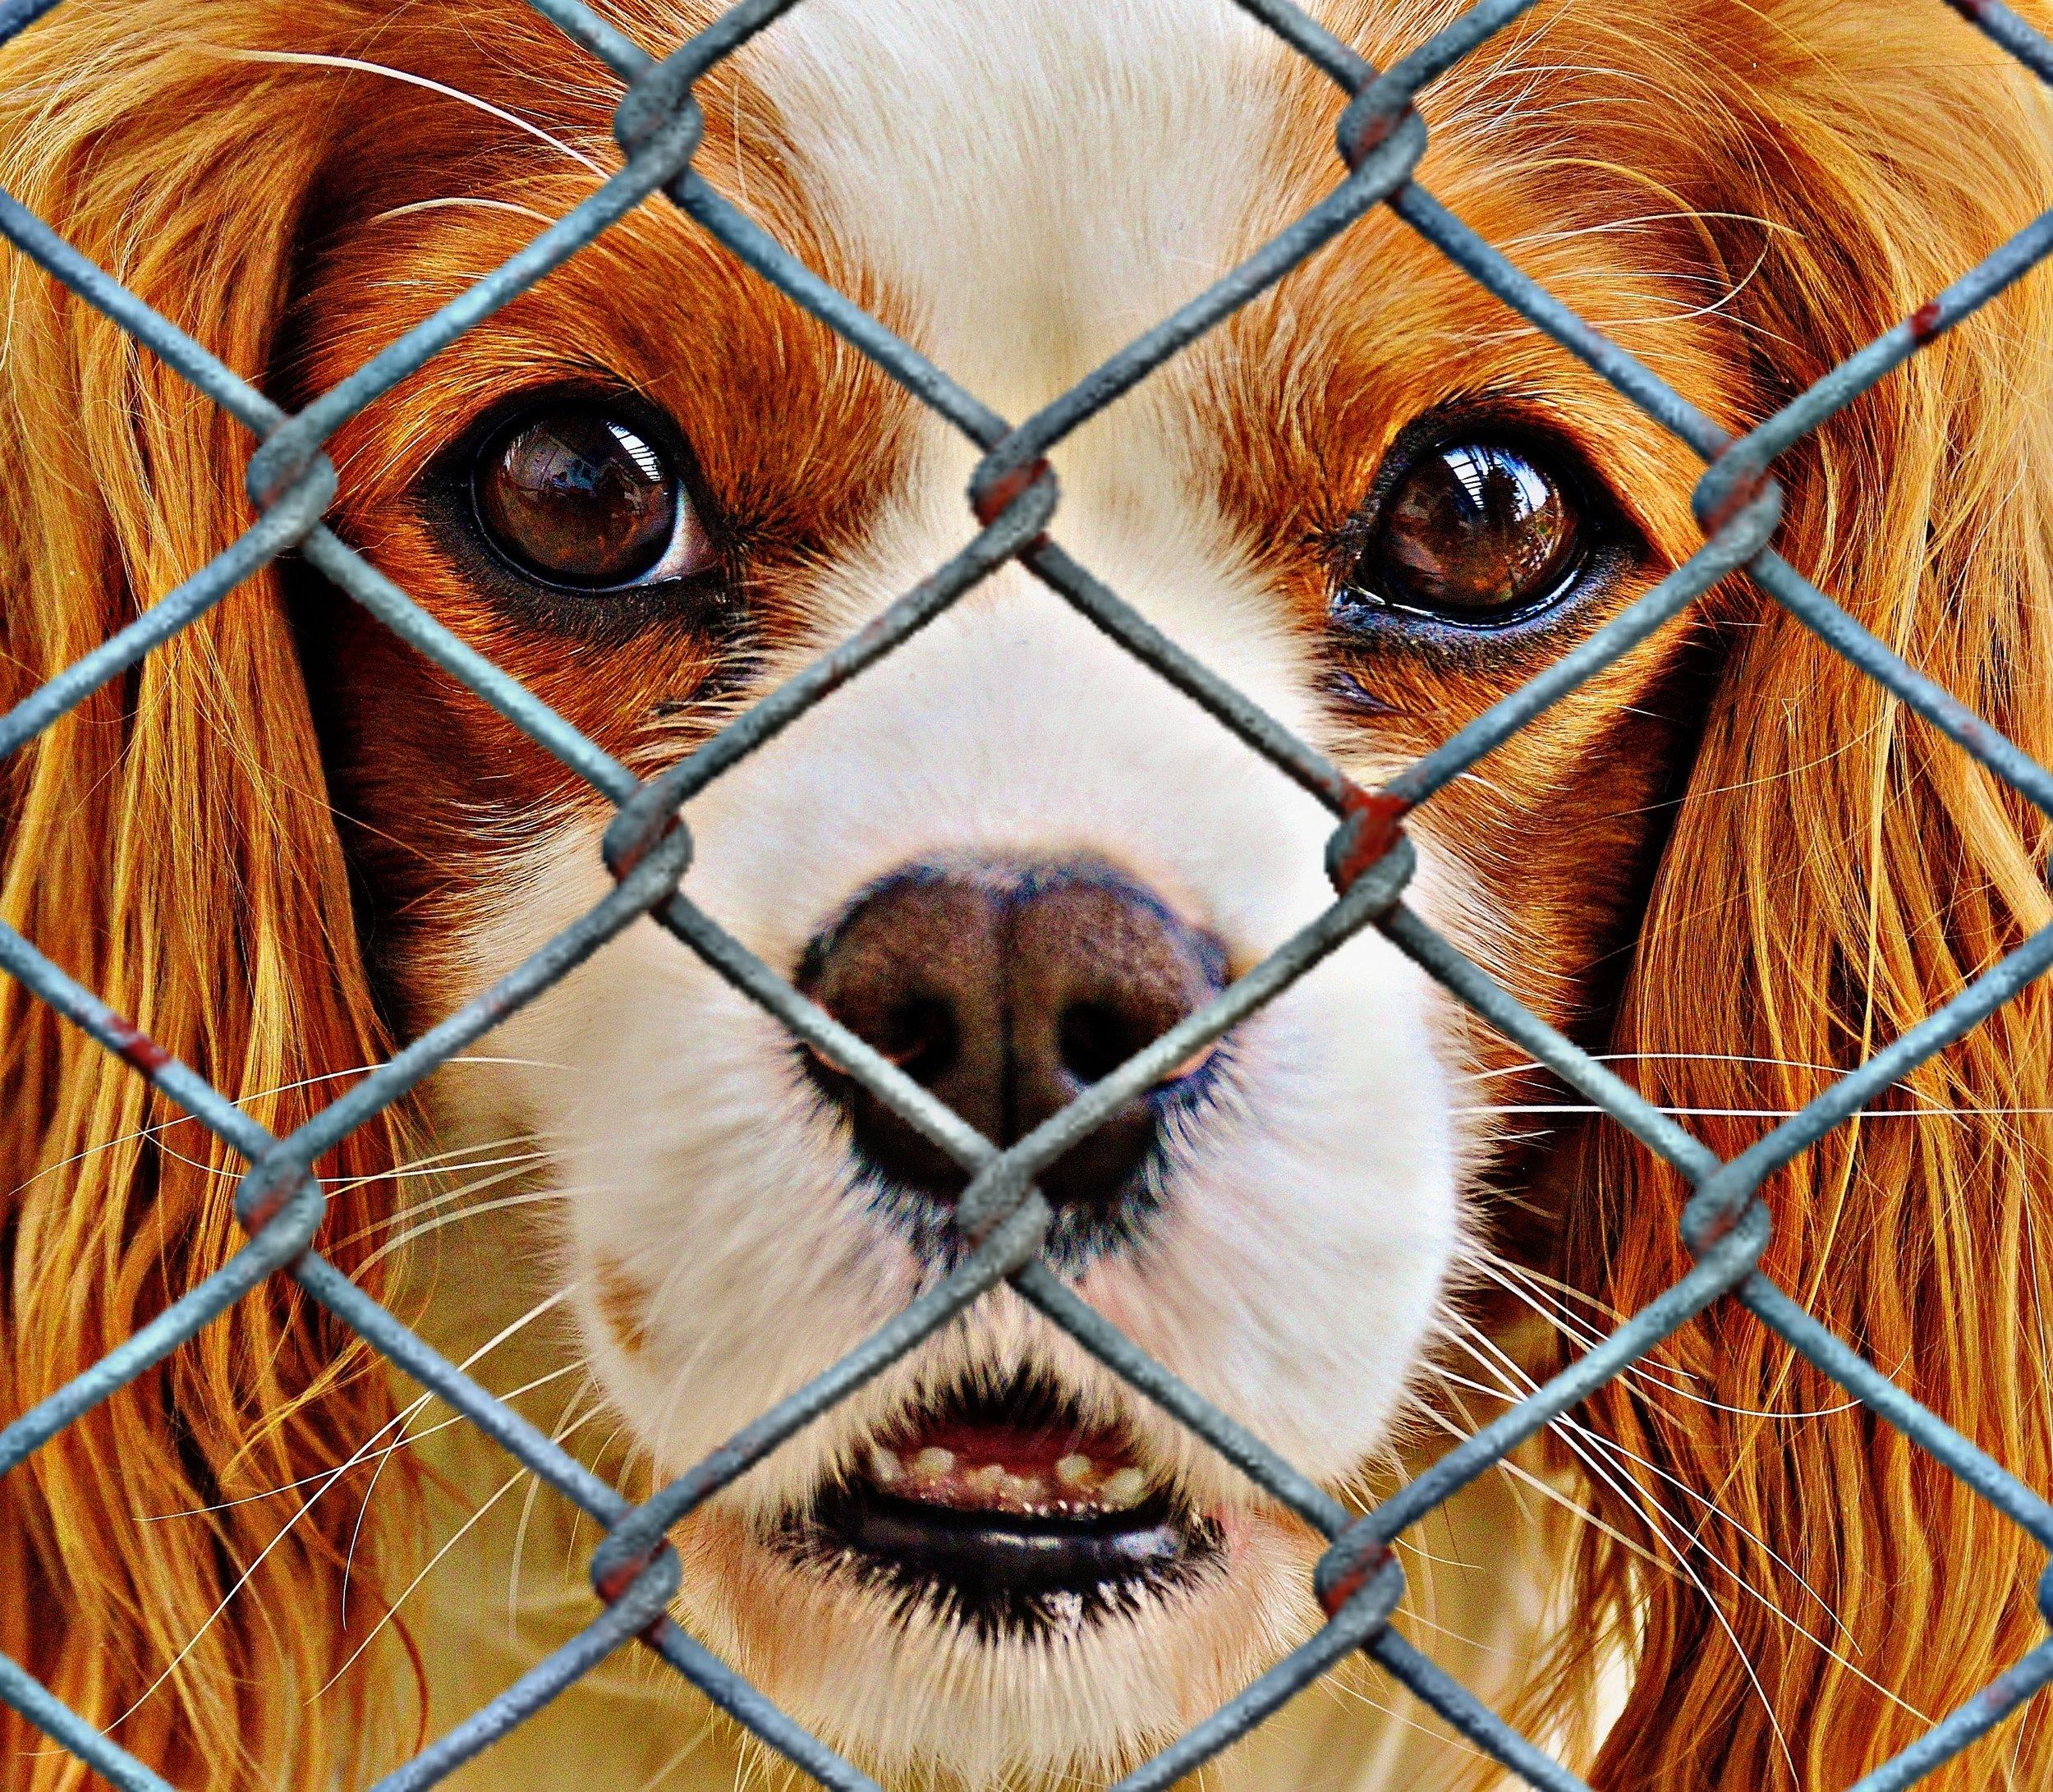 fence-sweet-puppy-dog-cute-mammal-833043-pxhere.com.jpg